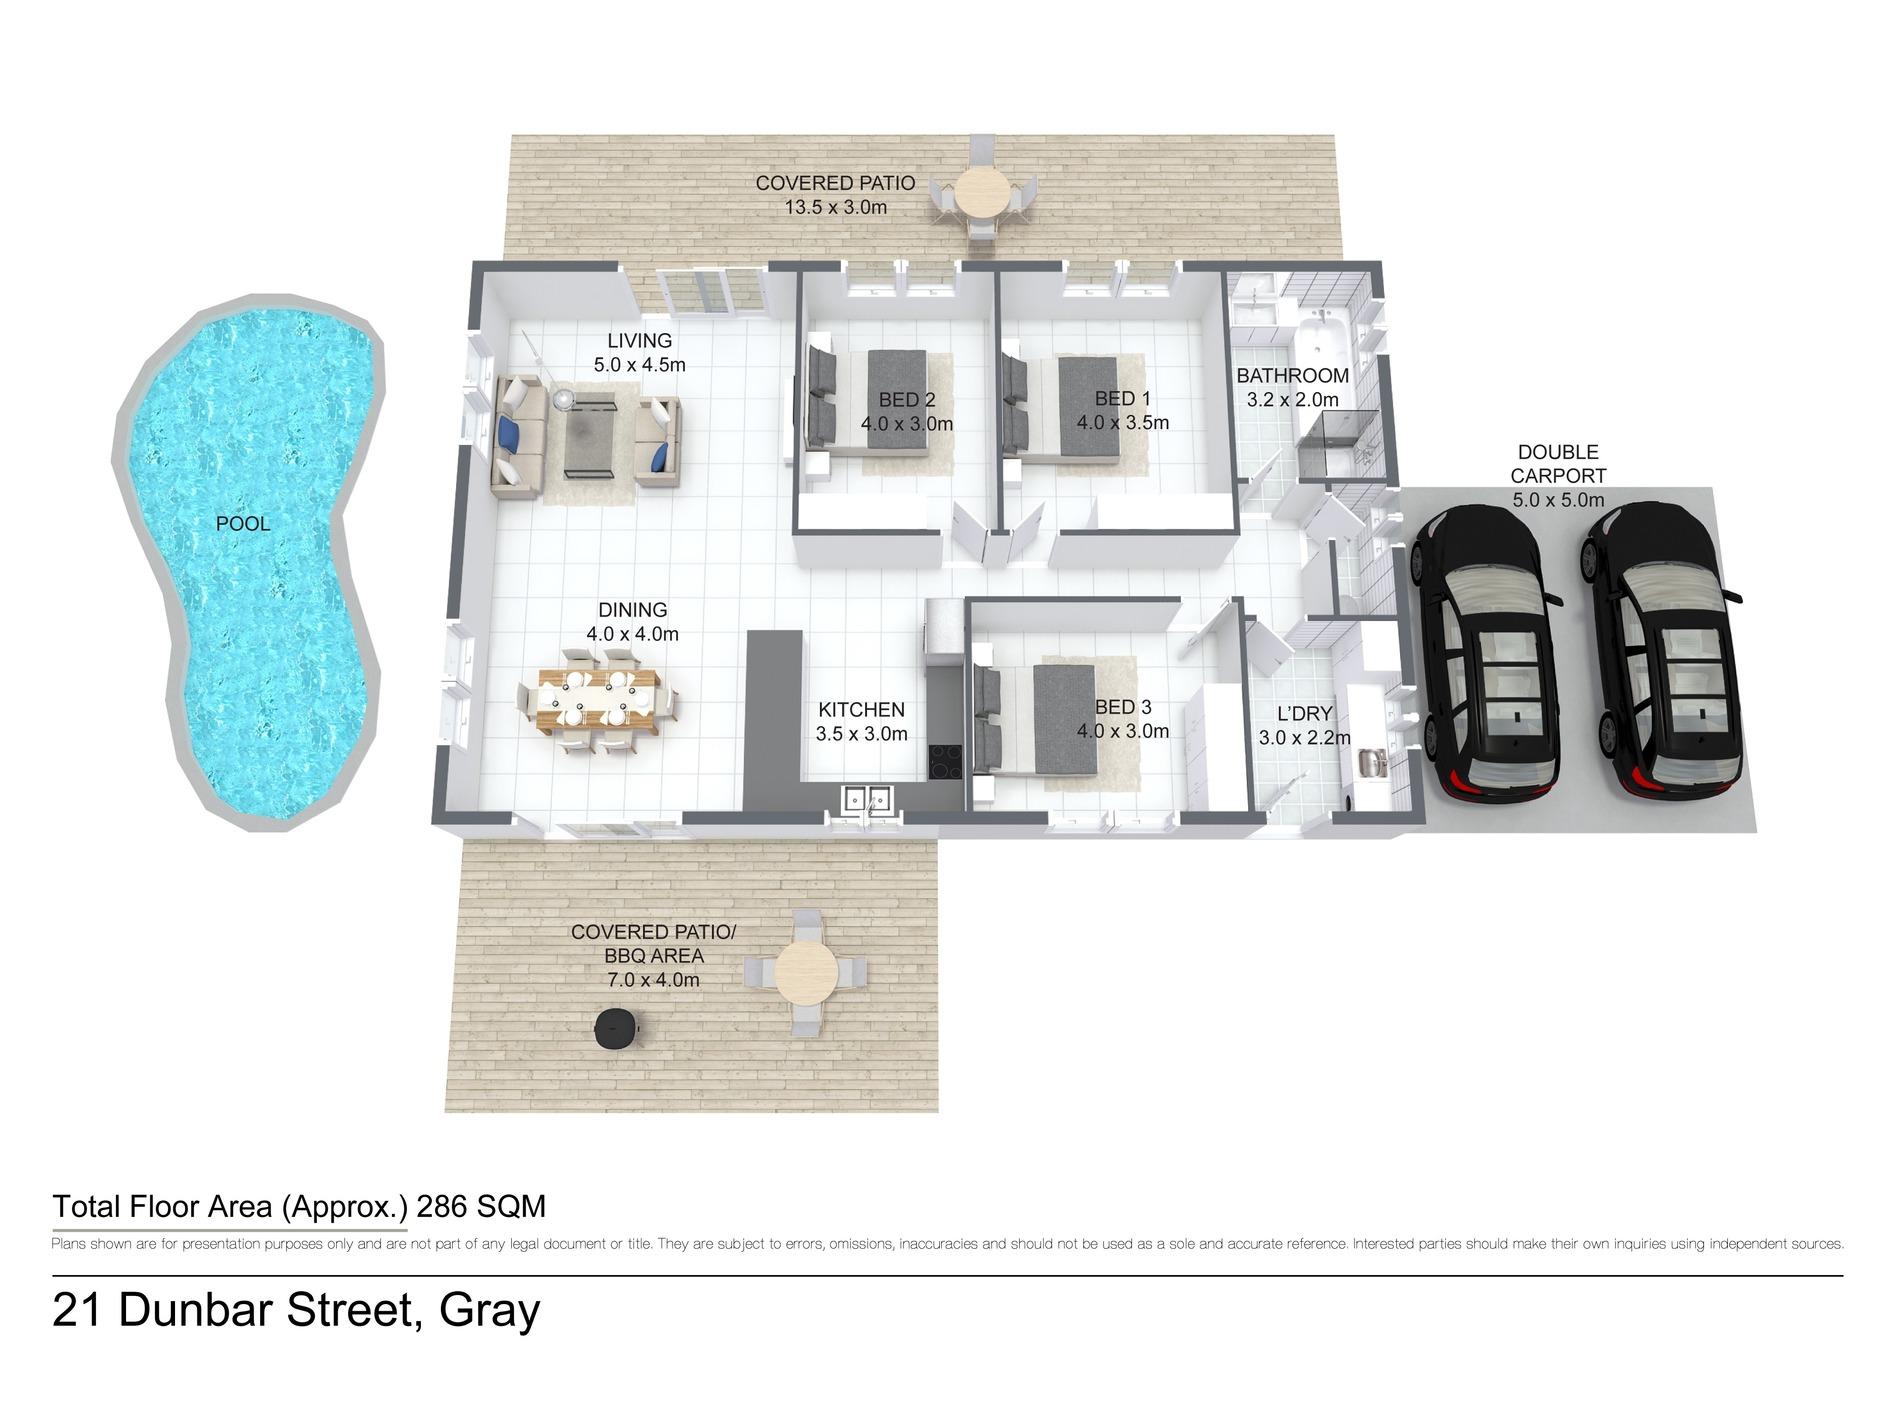 21 Dunbar Street, Gray